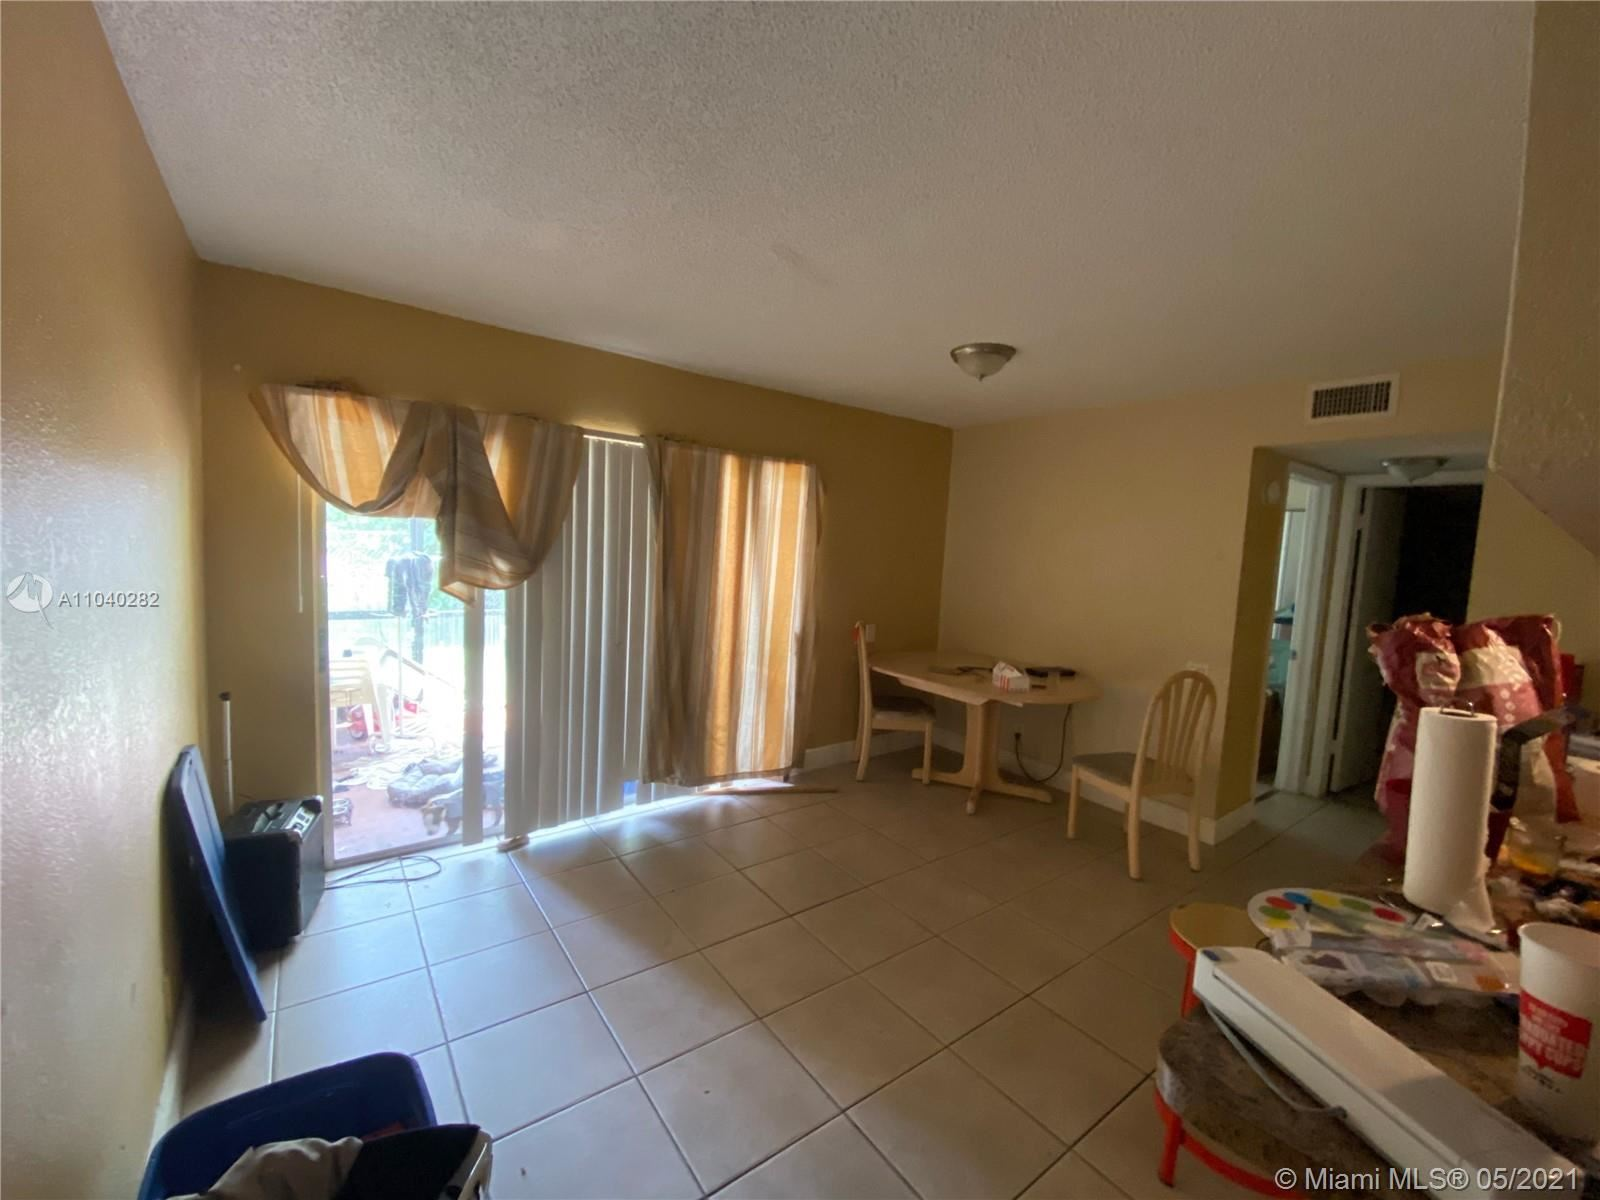 4439 Treehouse Lane #C, Tamarac, FL 33319 - #: A11040282